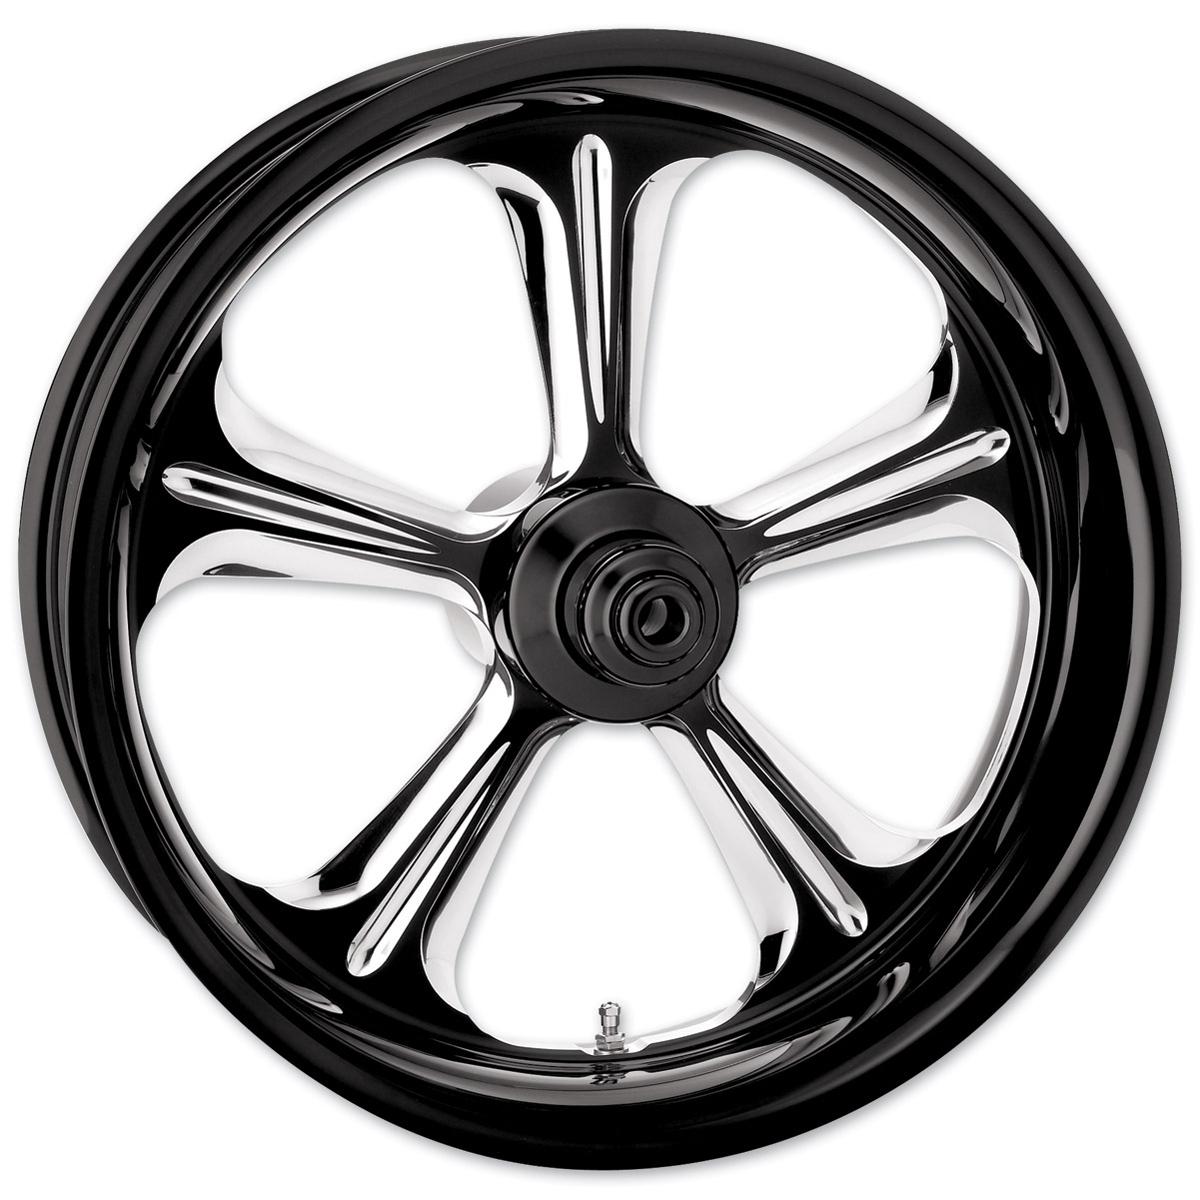 Performance Machine Wrath Platinum Cut Rear Wheel 18x5.5